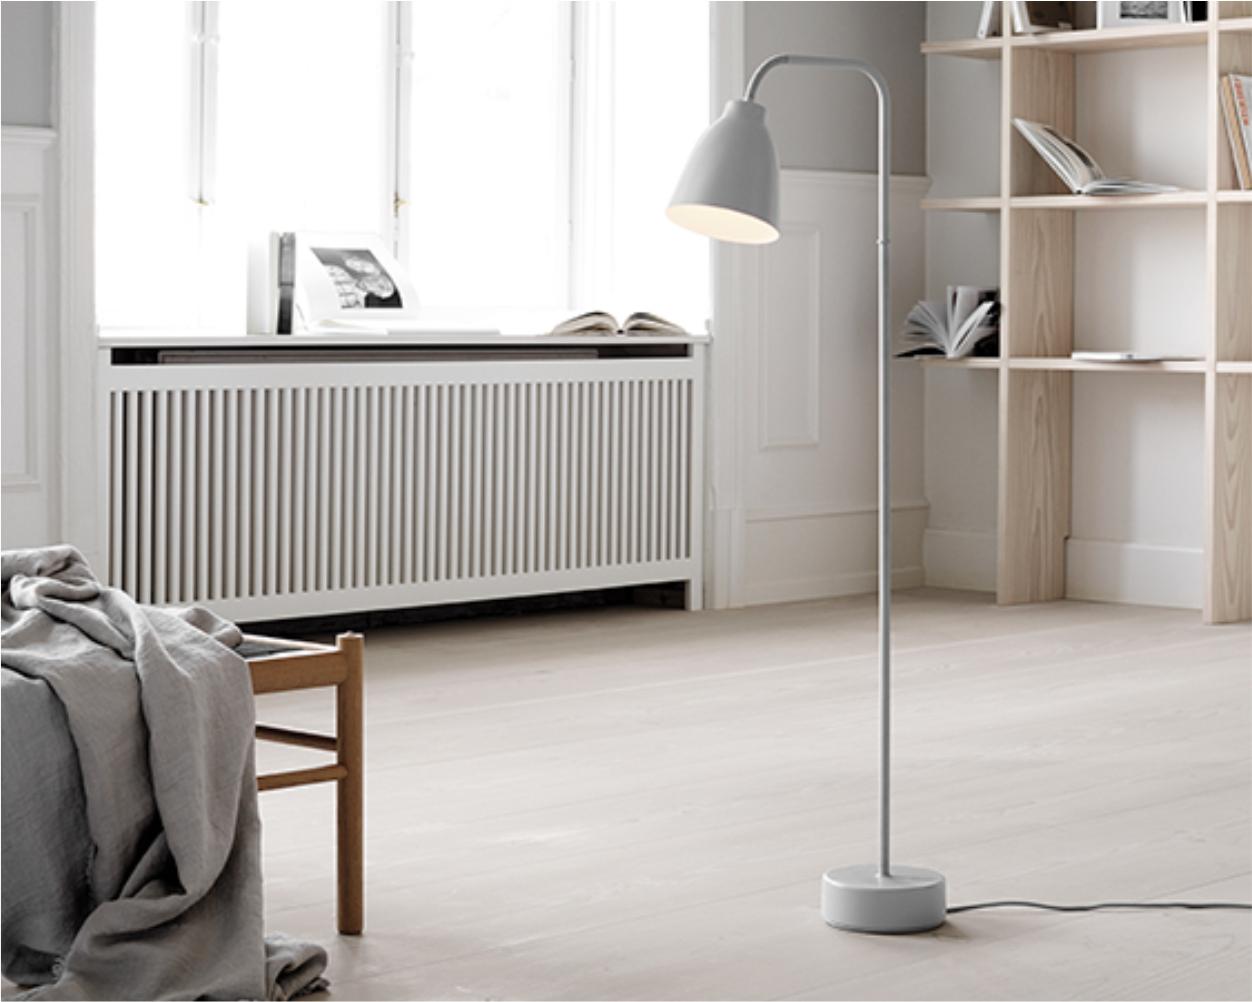 iluminat decorativ - lampadare, lampi de podea